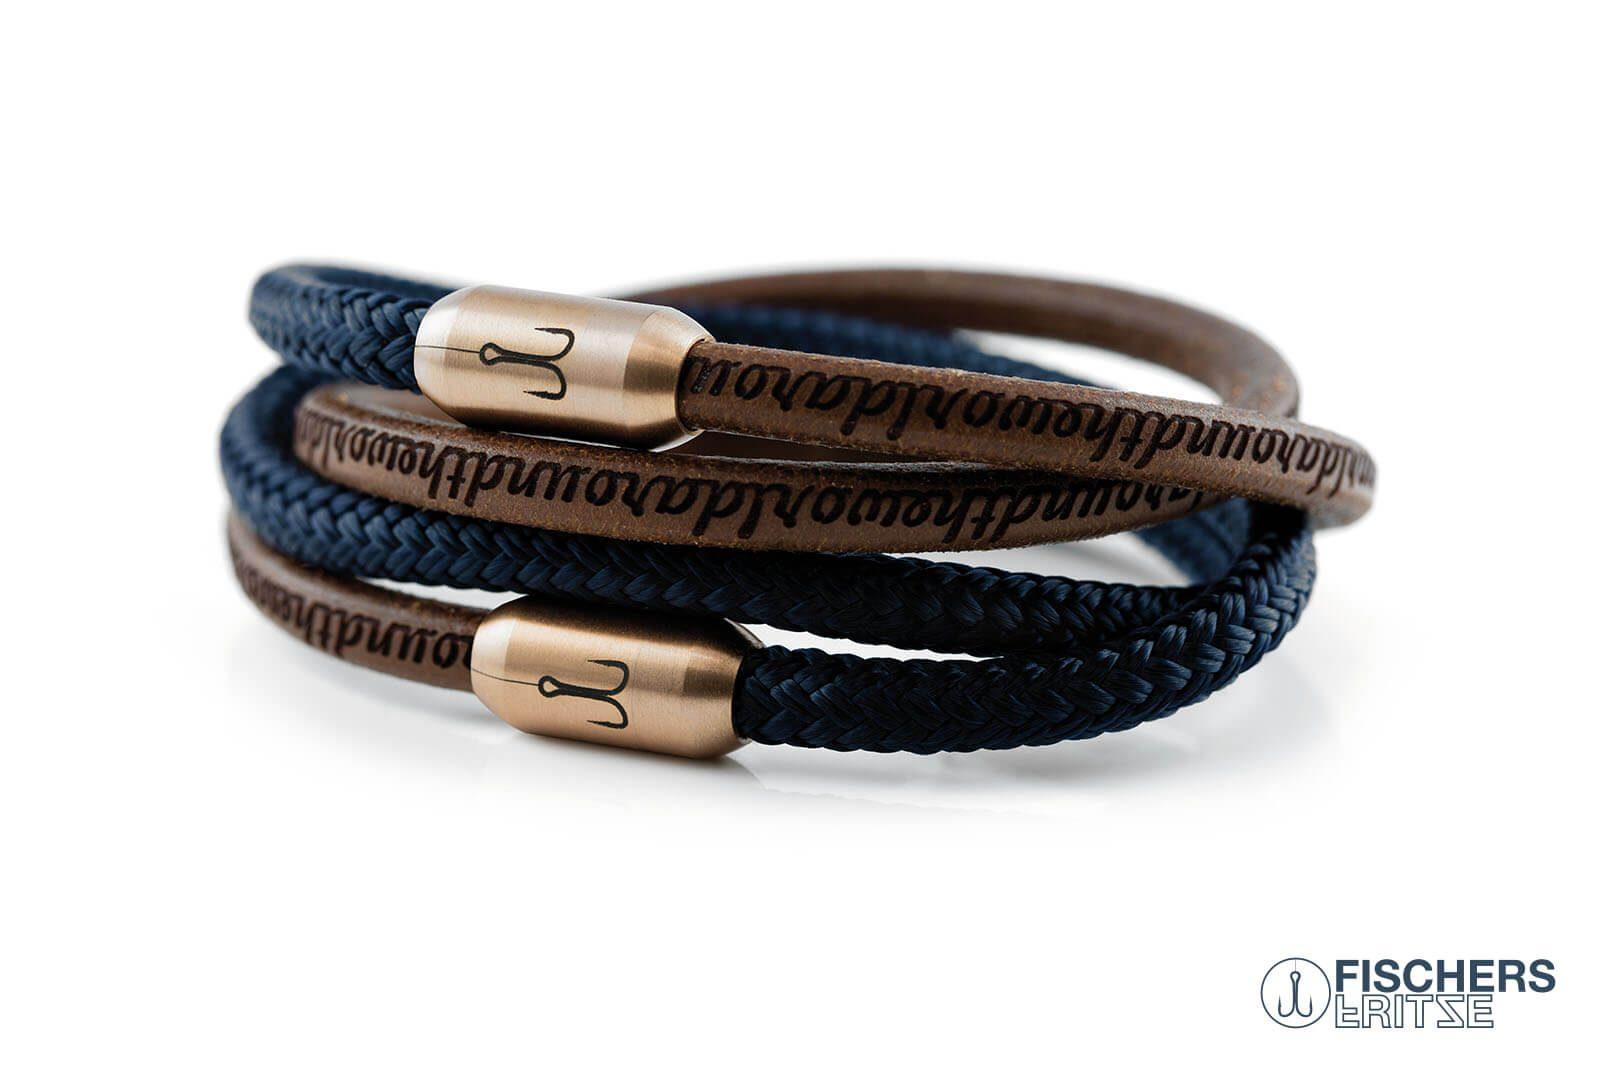 Armband Fischers Fritze Königsgarnele Kombination marineblau Segeltau Edelstahl Leder braun